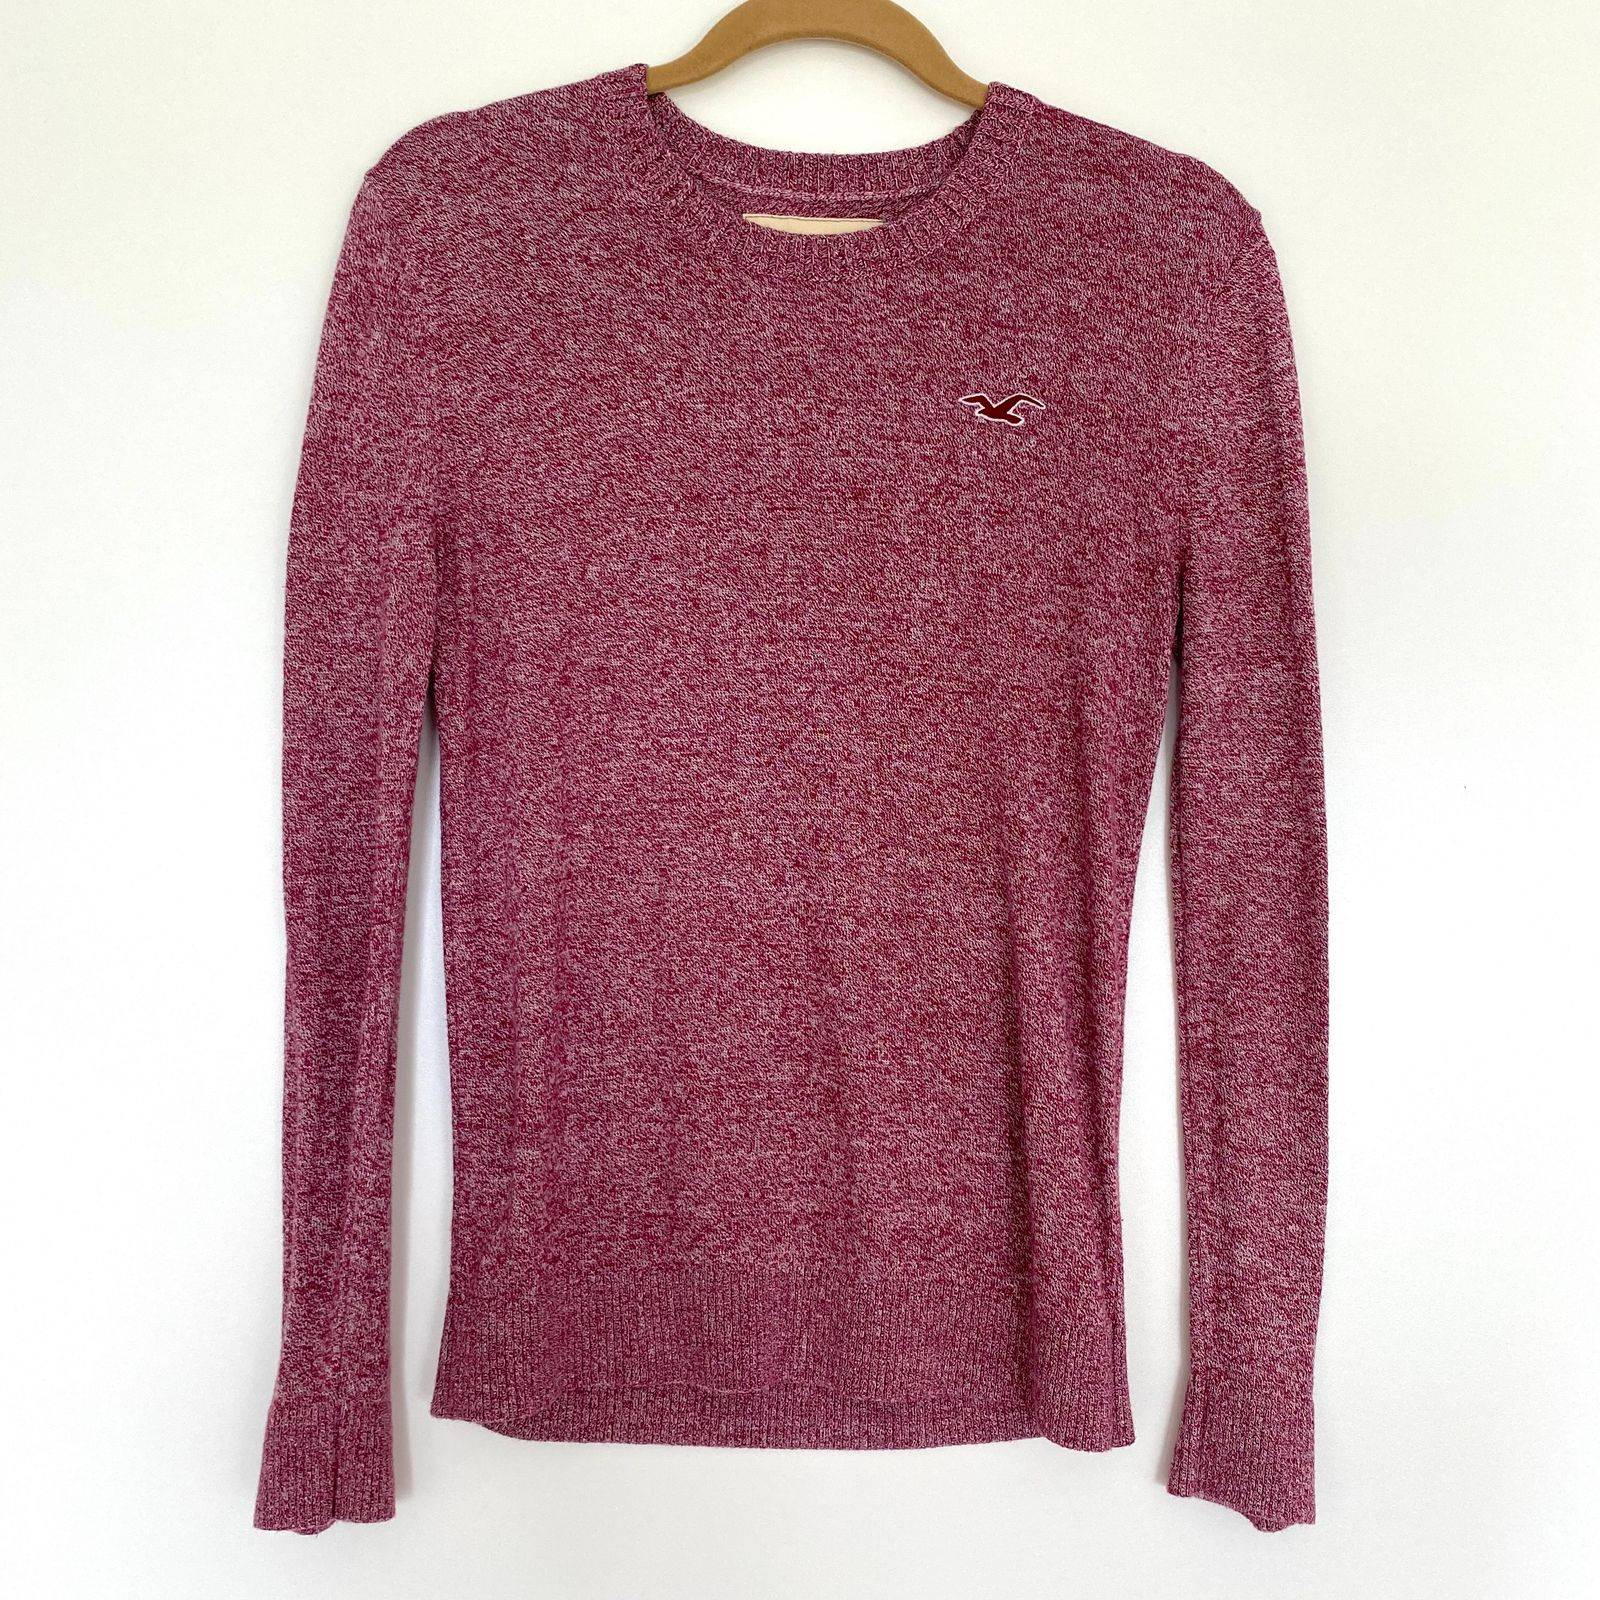 Hollister Burgundy Long Sleeve Sweater